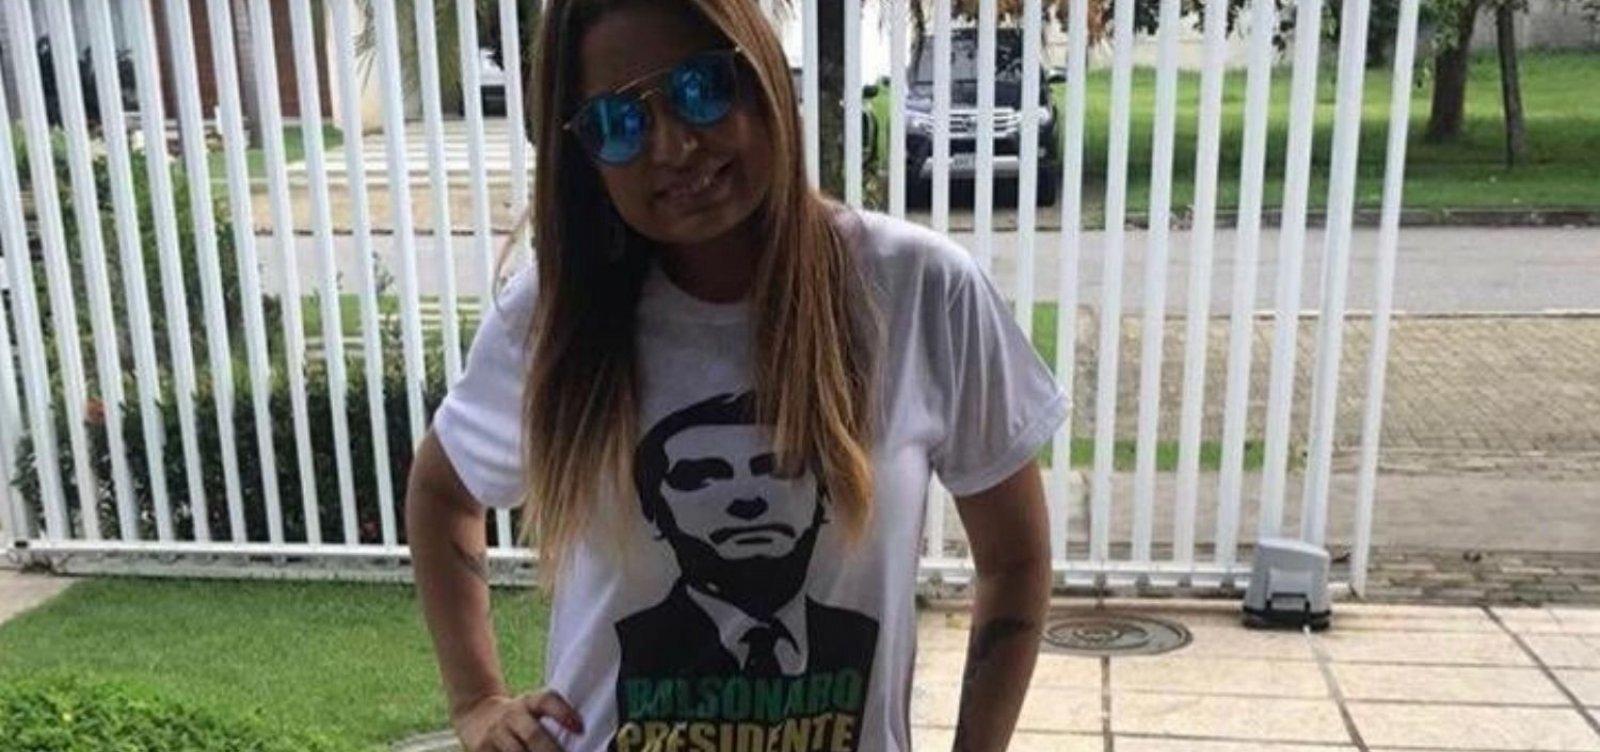 [Chefe de MP no Rio recebe pedidos para afastar promotora que fez campanha para Bolsonaro]